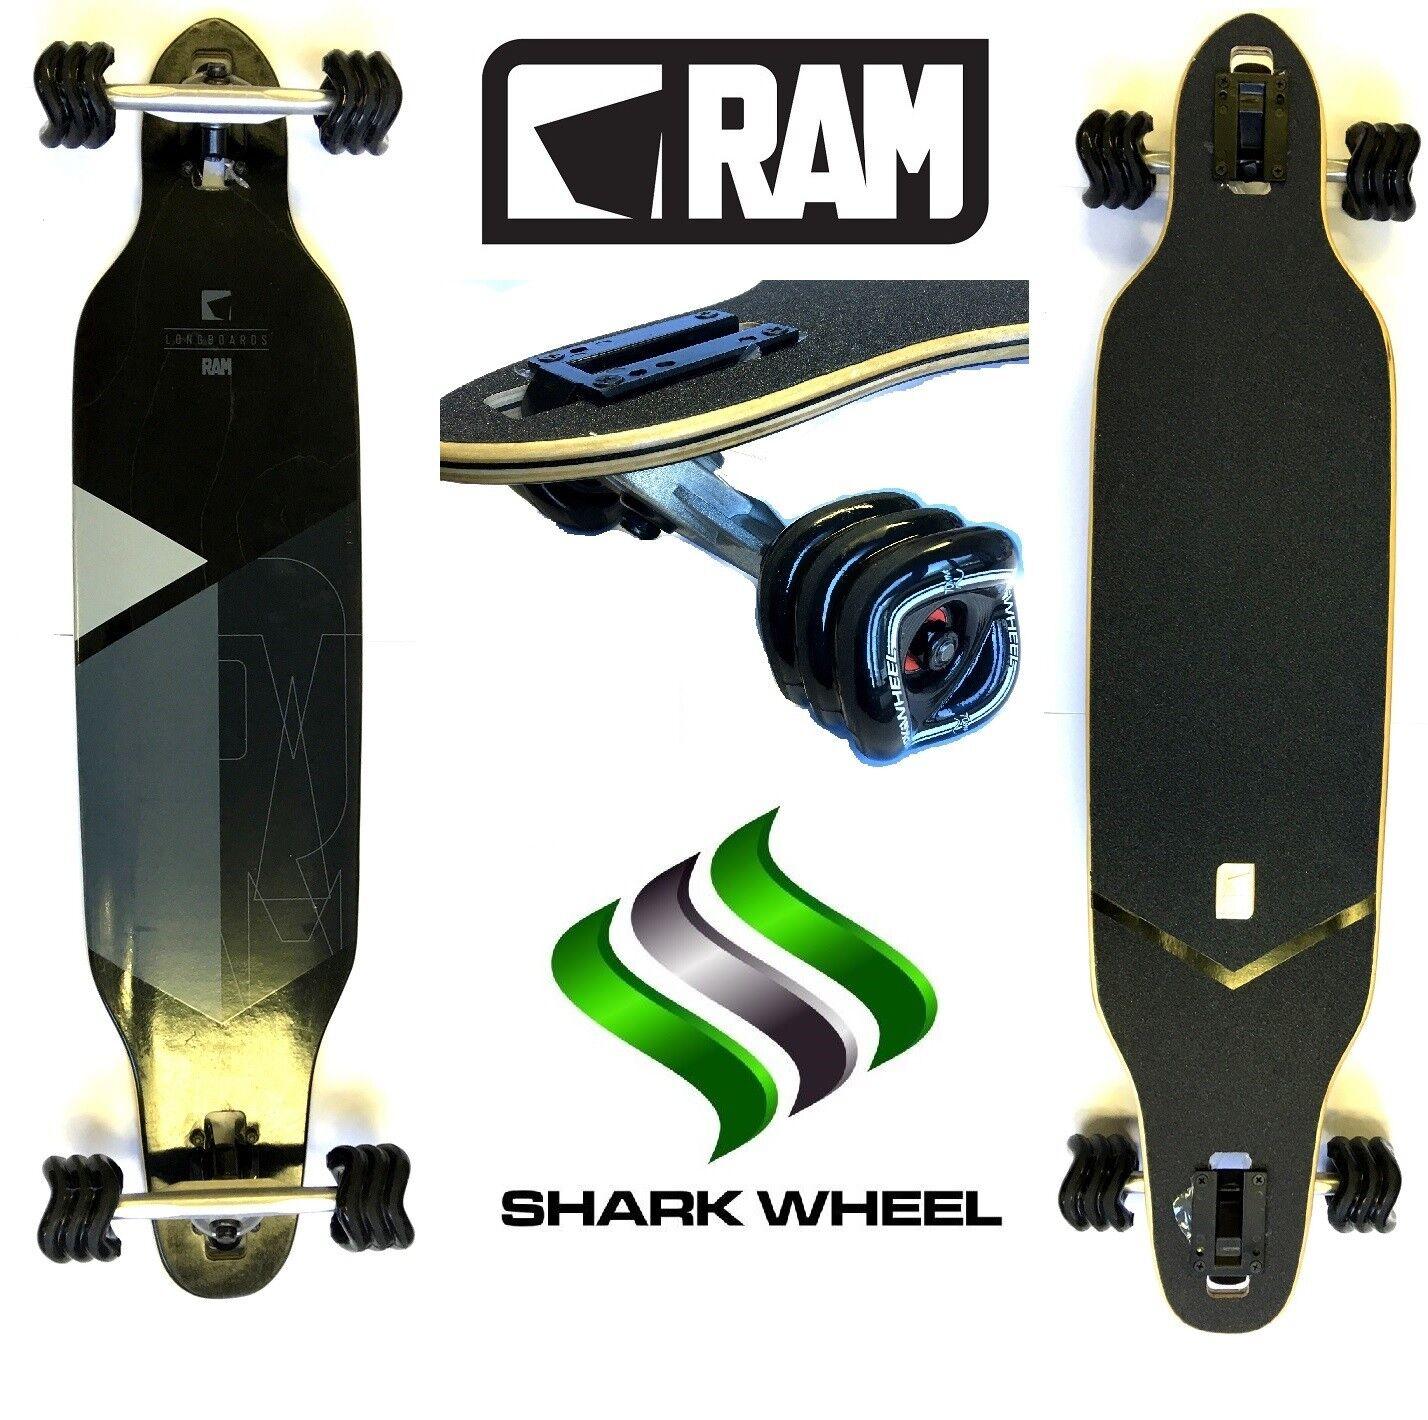 F26 Longboard RAM Solitary Solitary Solitary 2.0  mit Sidewinder   Mako Shark Wheels galileo abec9 cf4a4a